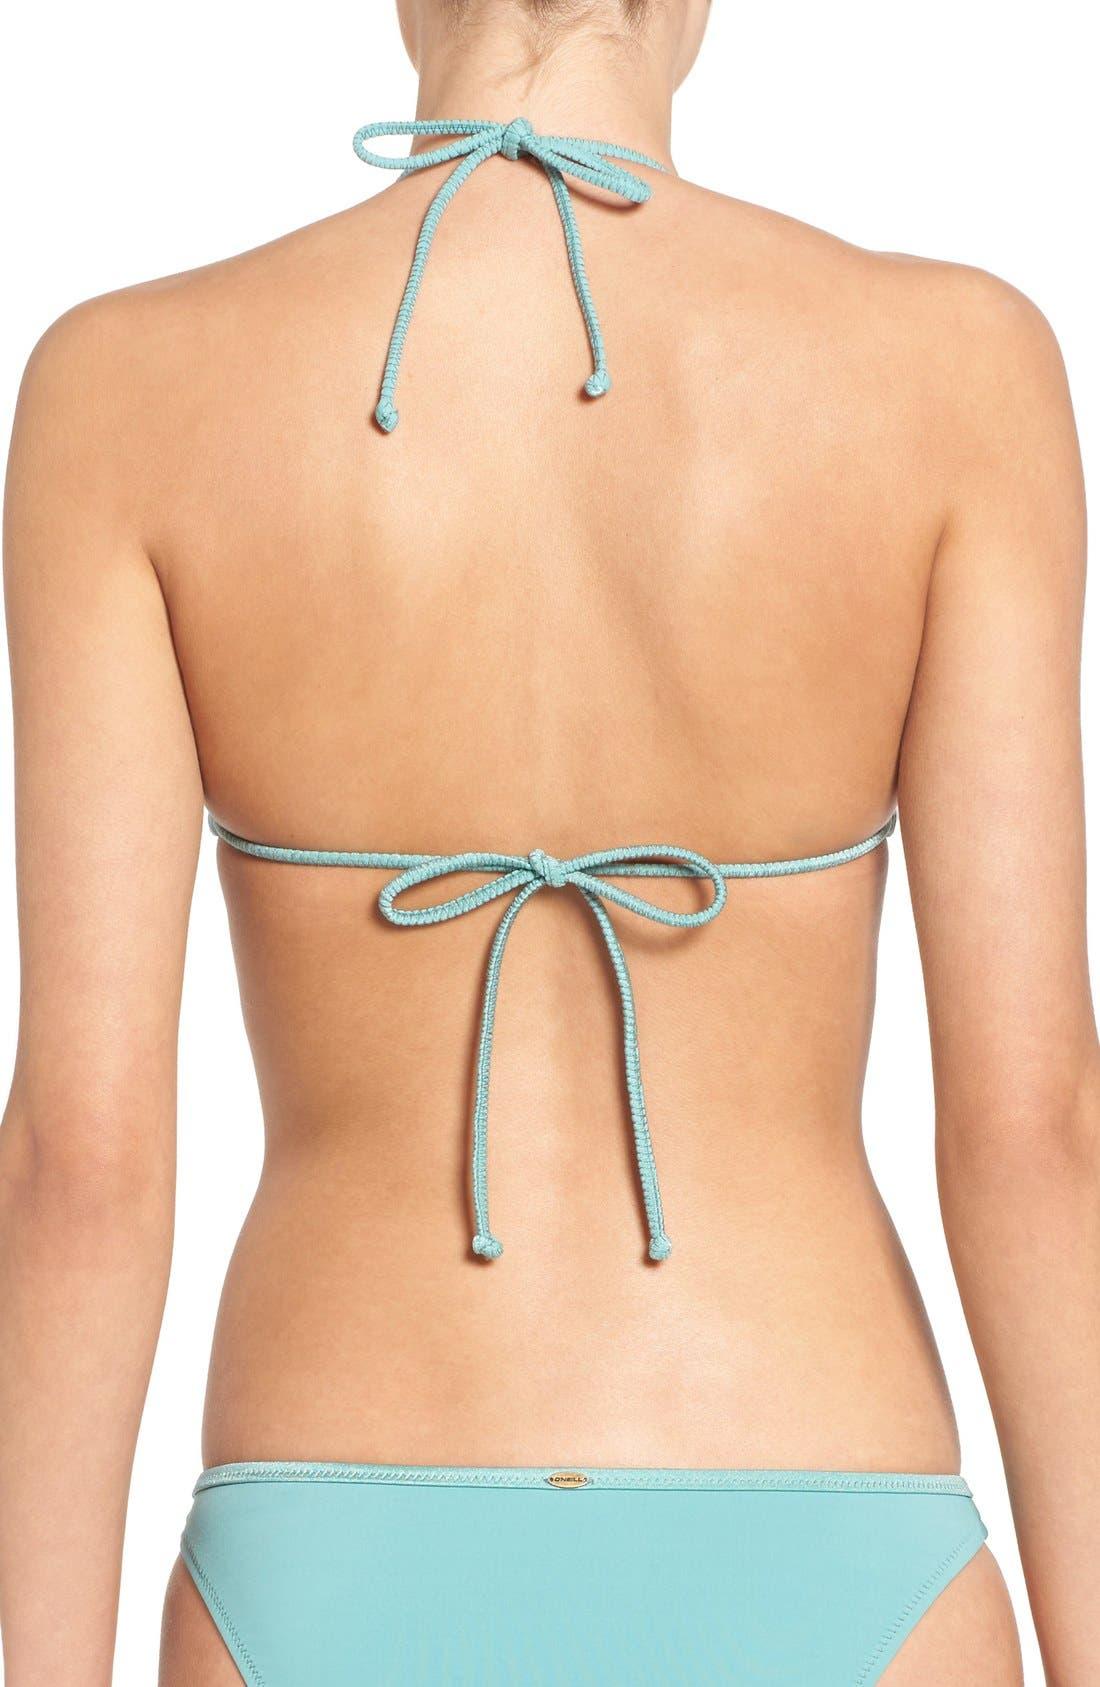 Alternate Image 2  - O'Neill 'Antoinette' Triangle Bikini Top